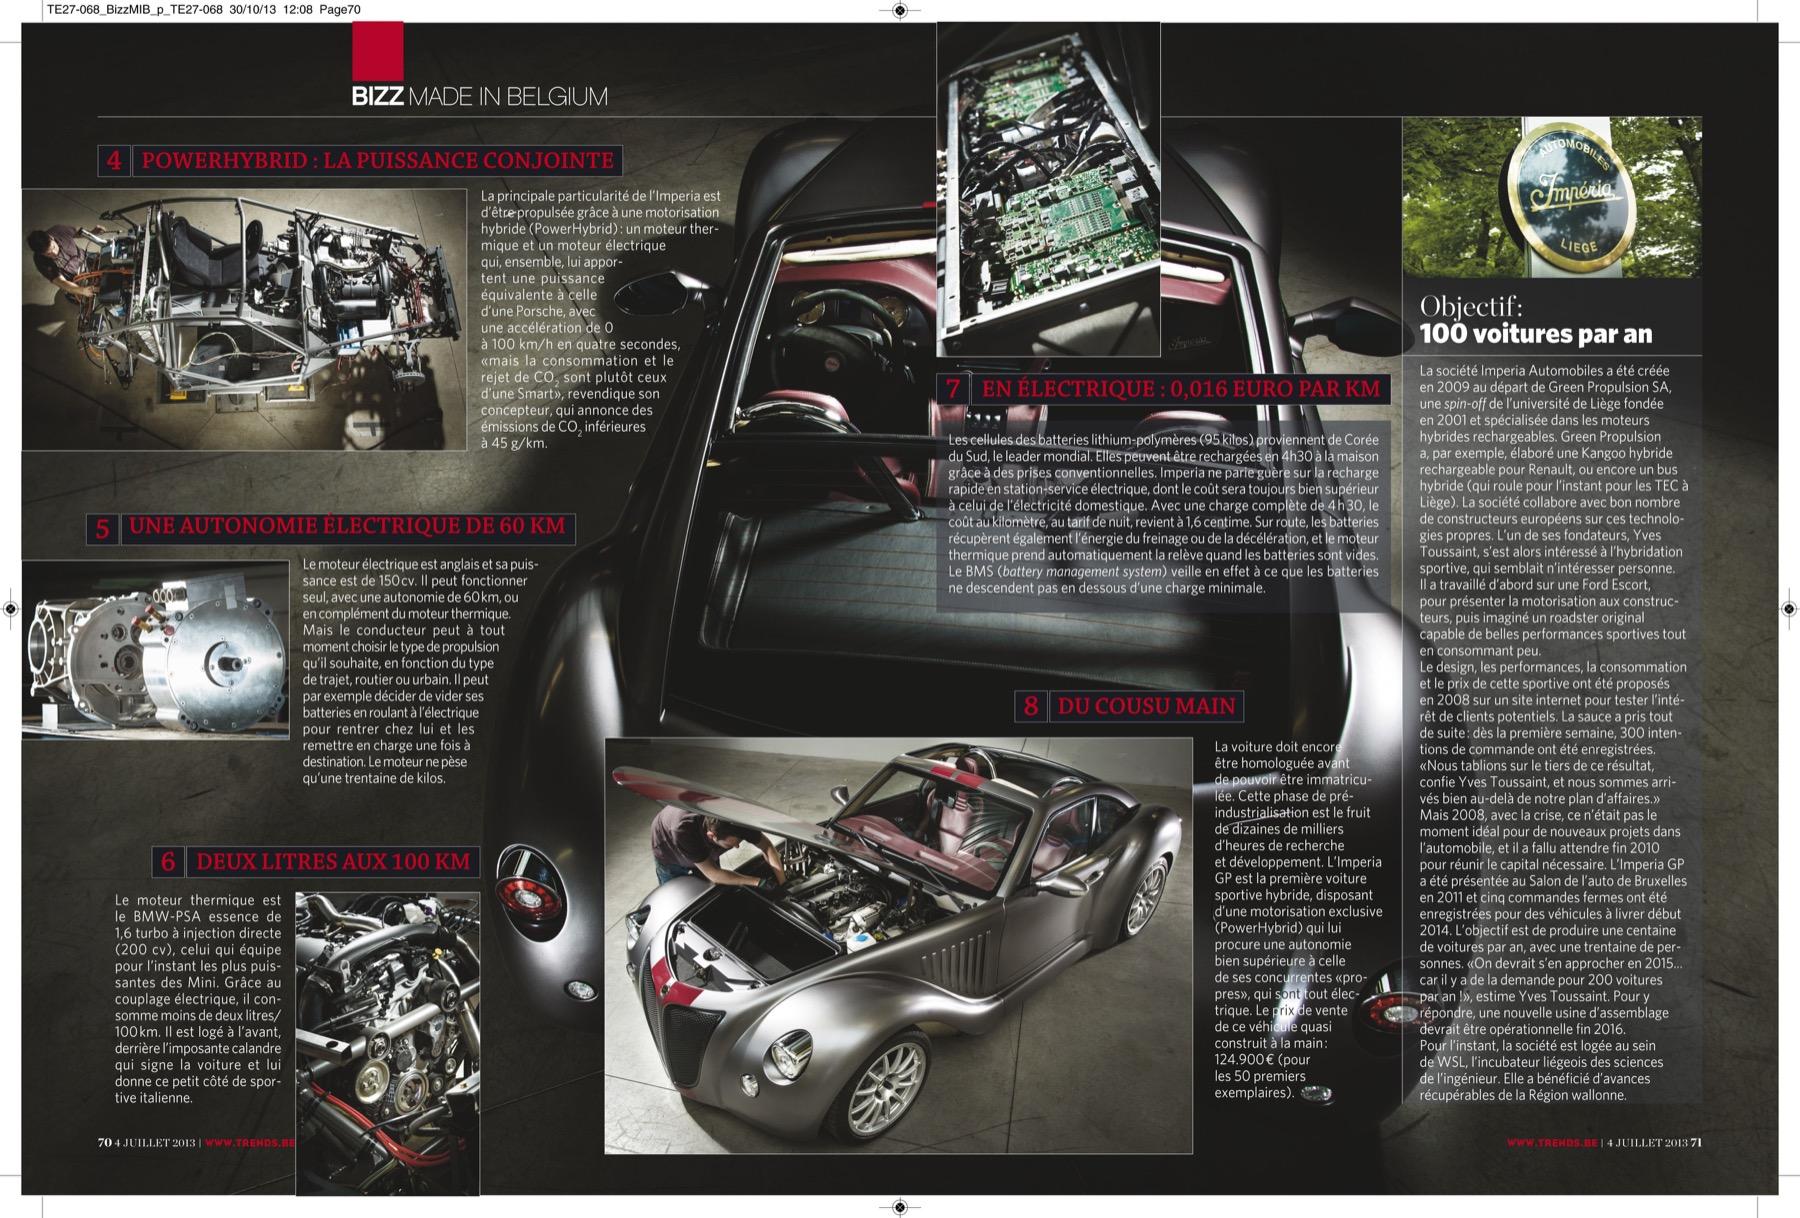 Bizz Magazine Imperia